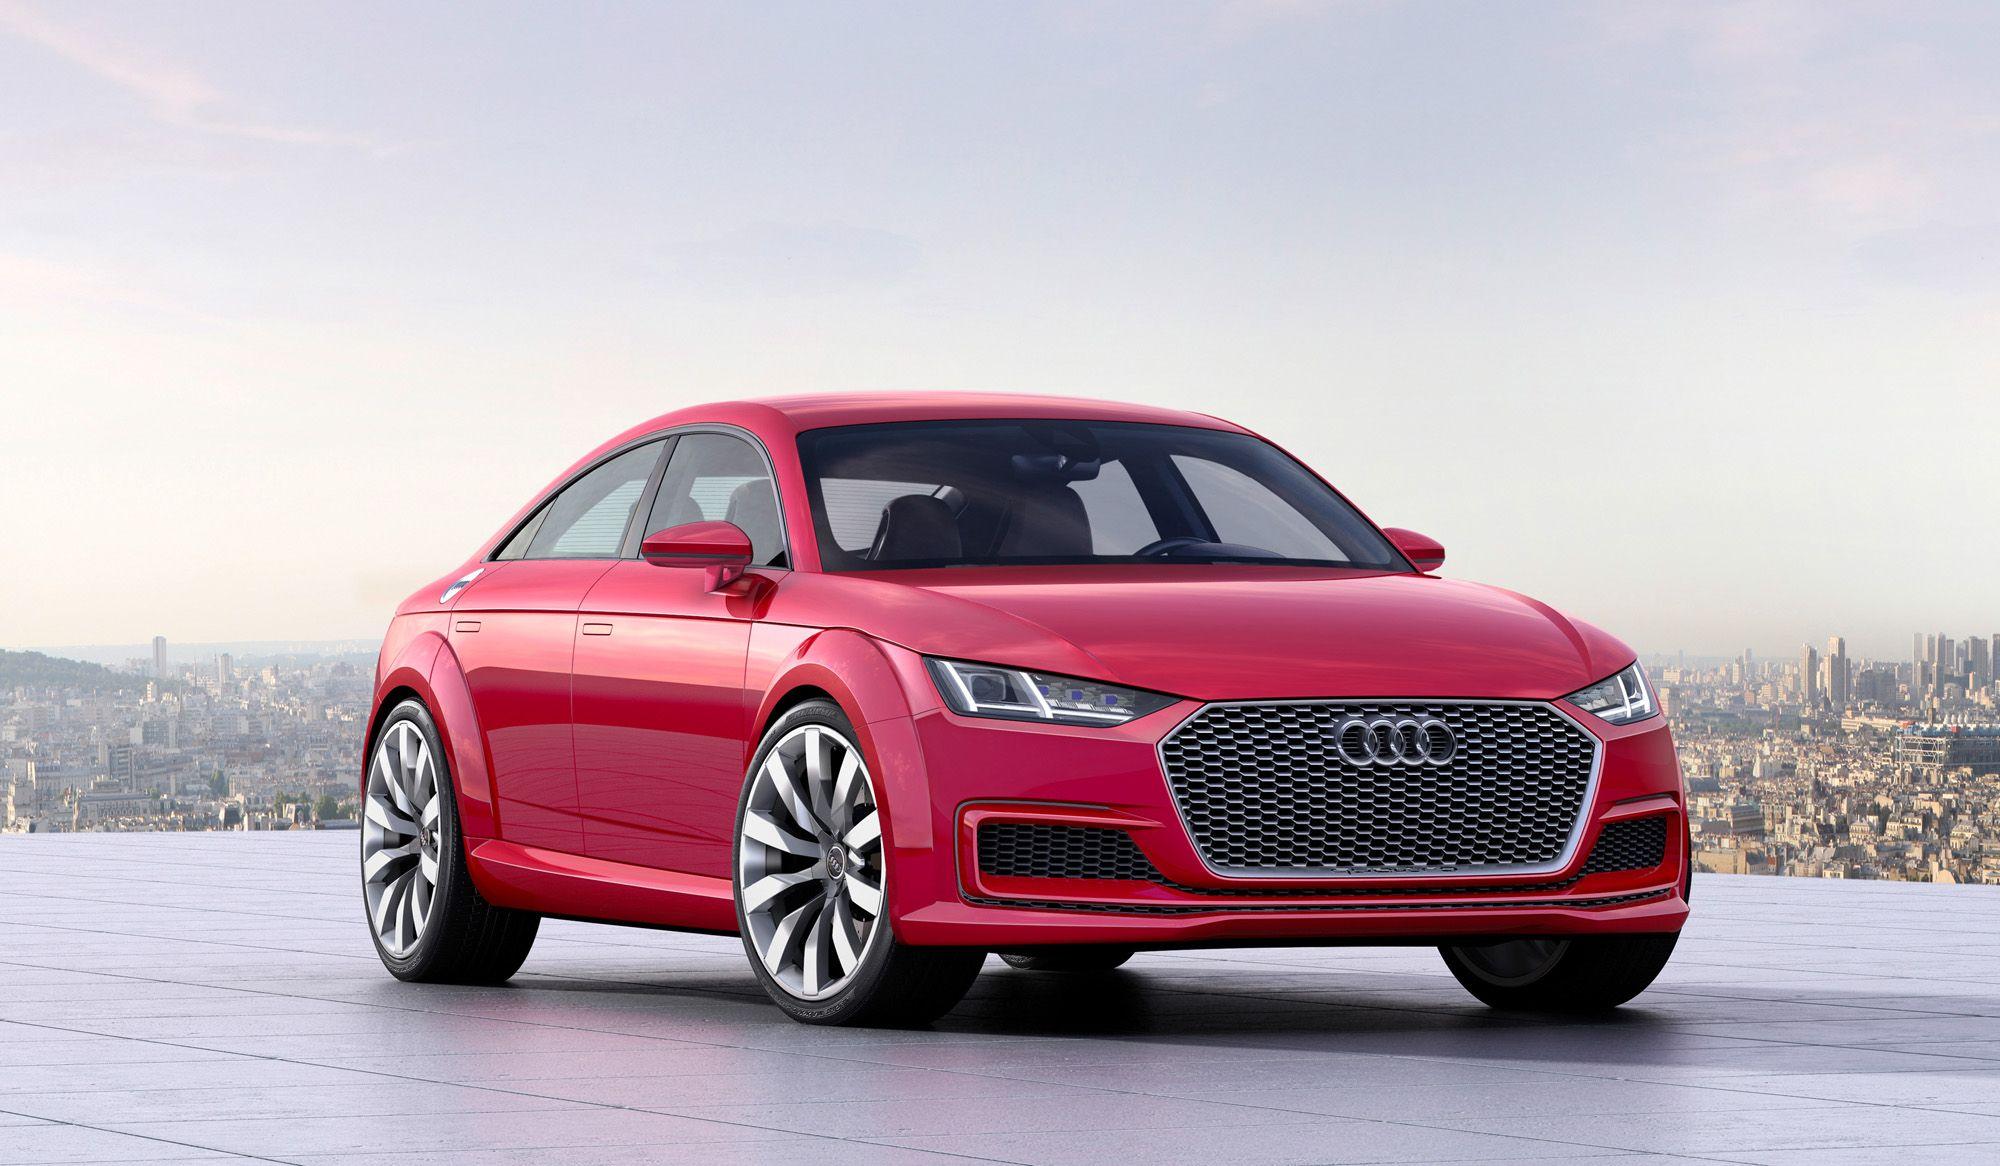 Audi TT Sportback concept 8S: Kombi mit Mehrwert? | Autos, Magazin ...